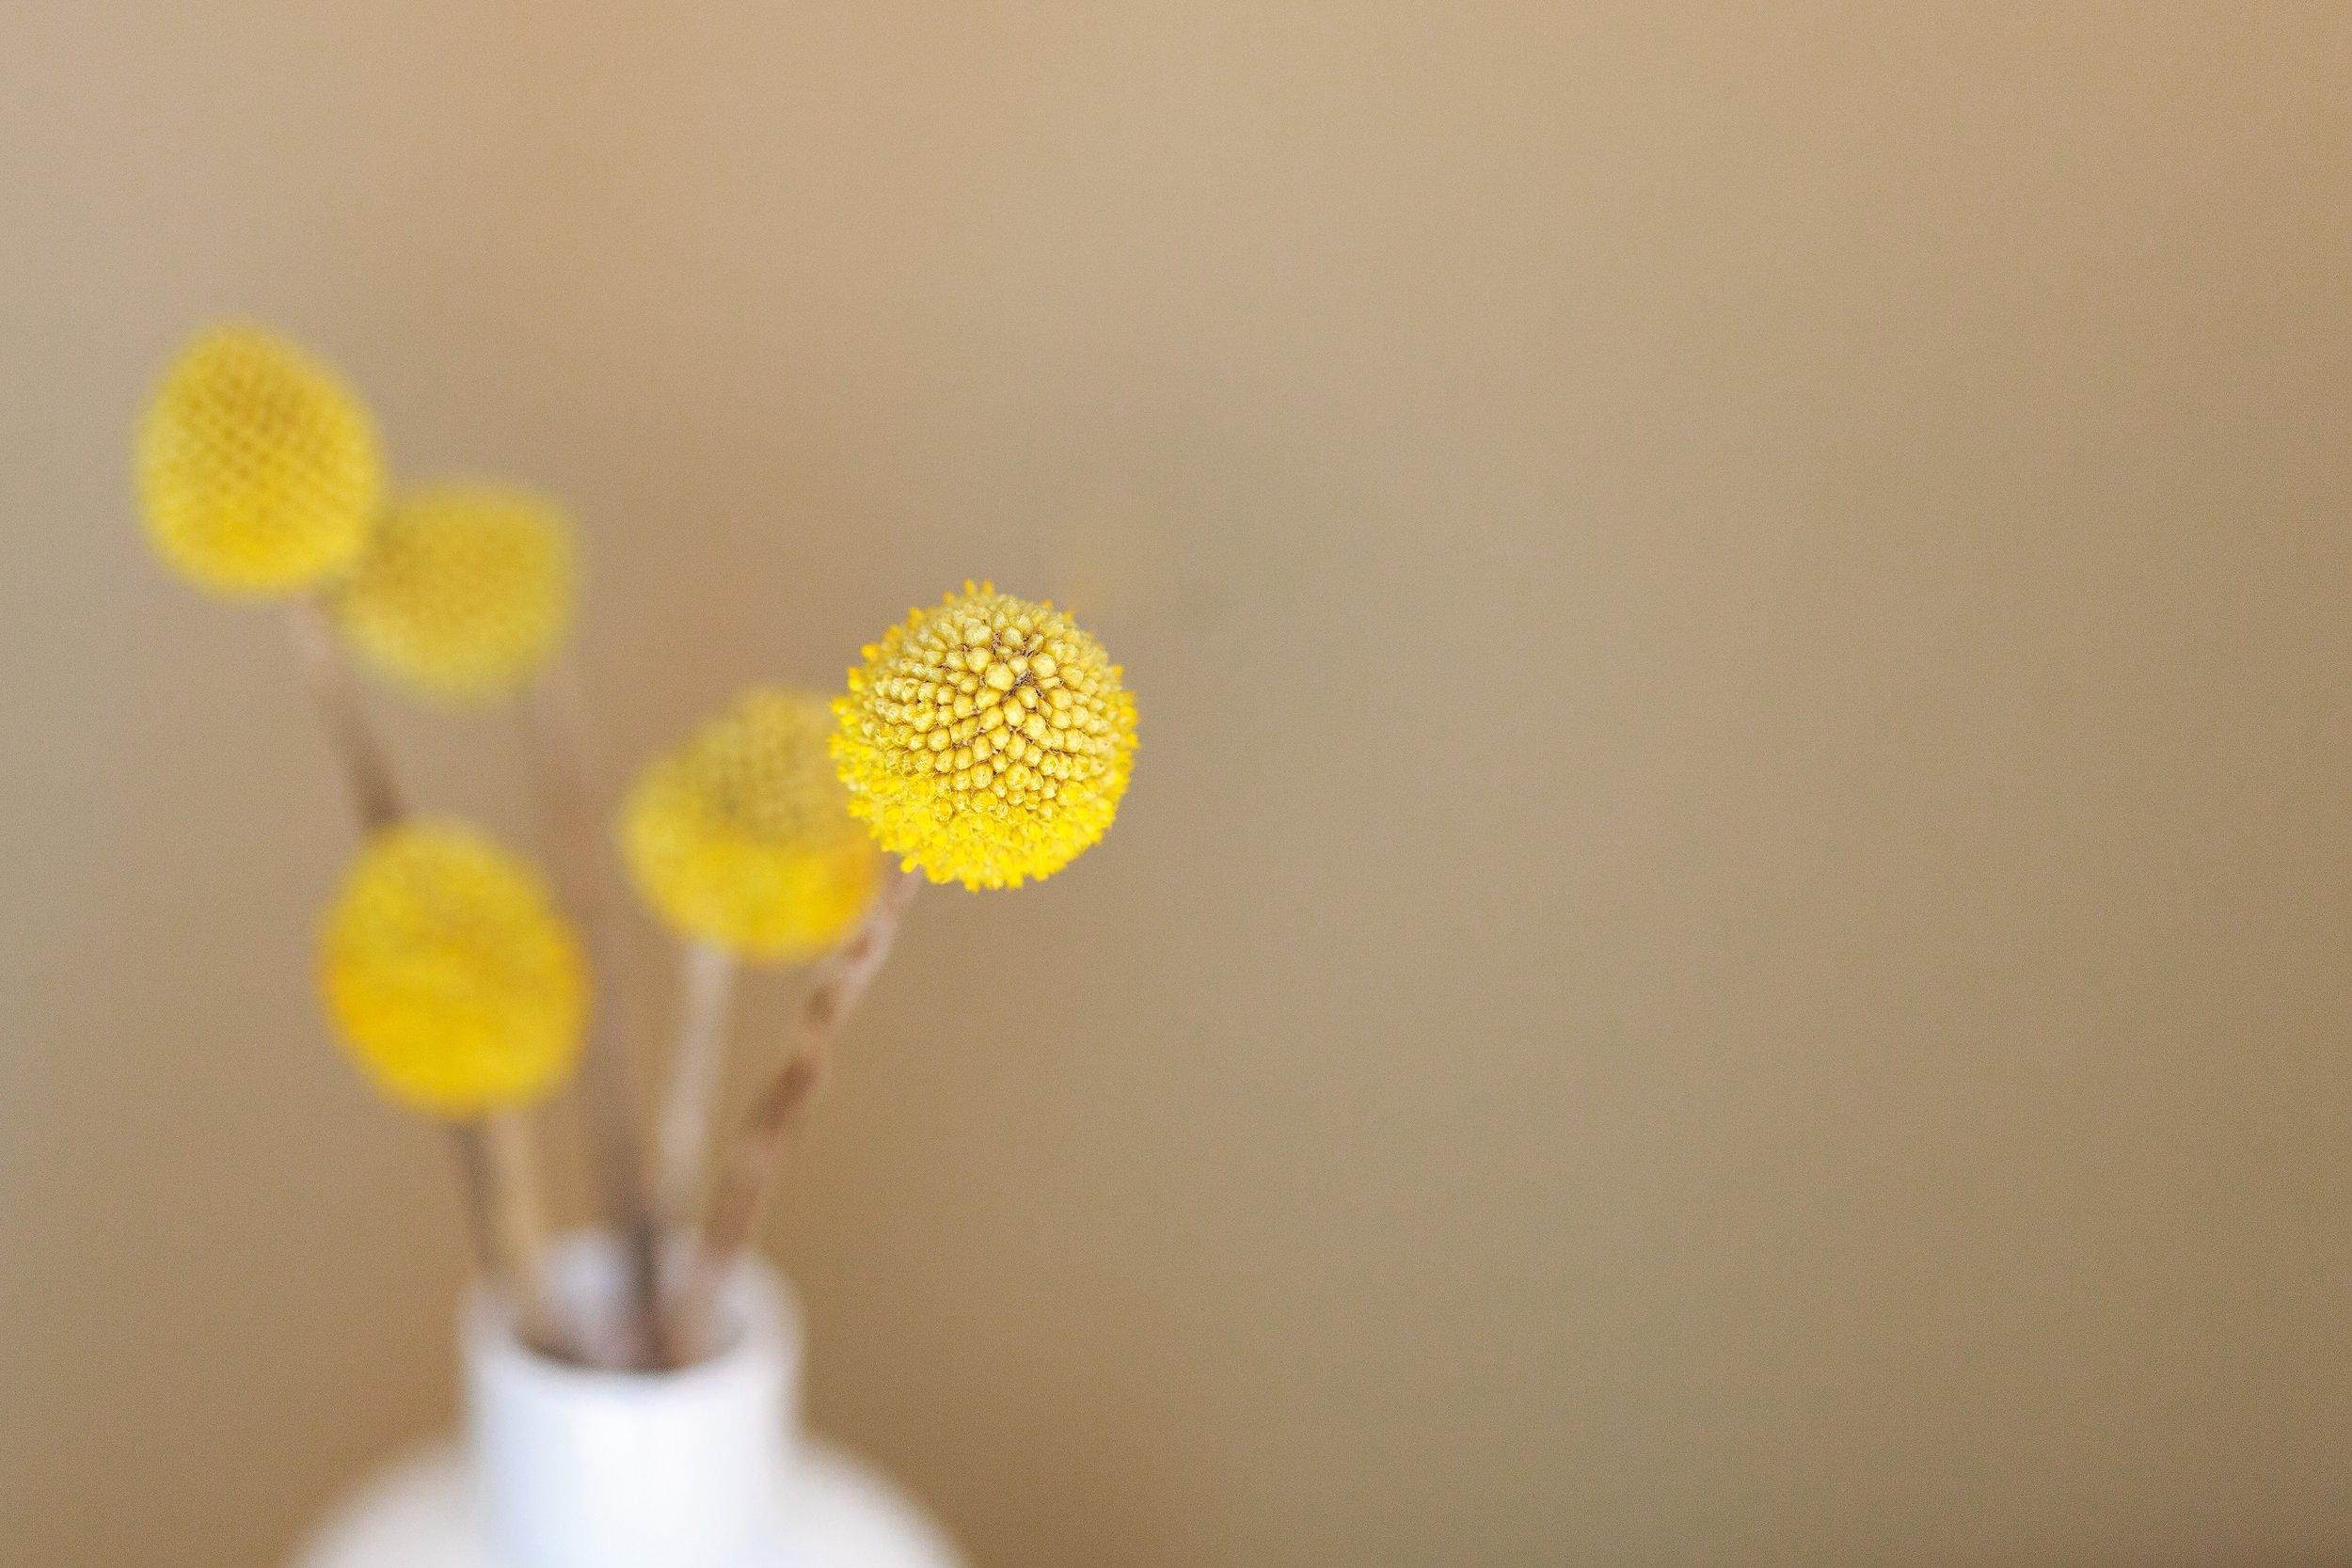 yellowflower-danielle-macinnes-72290-unsplash.jpg